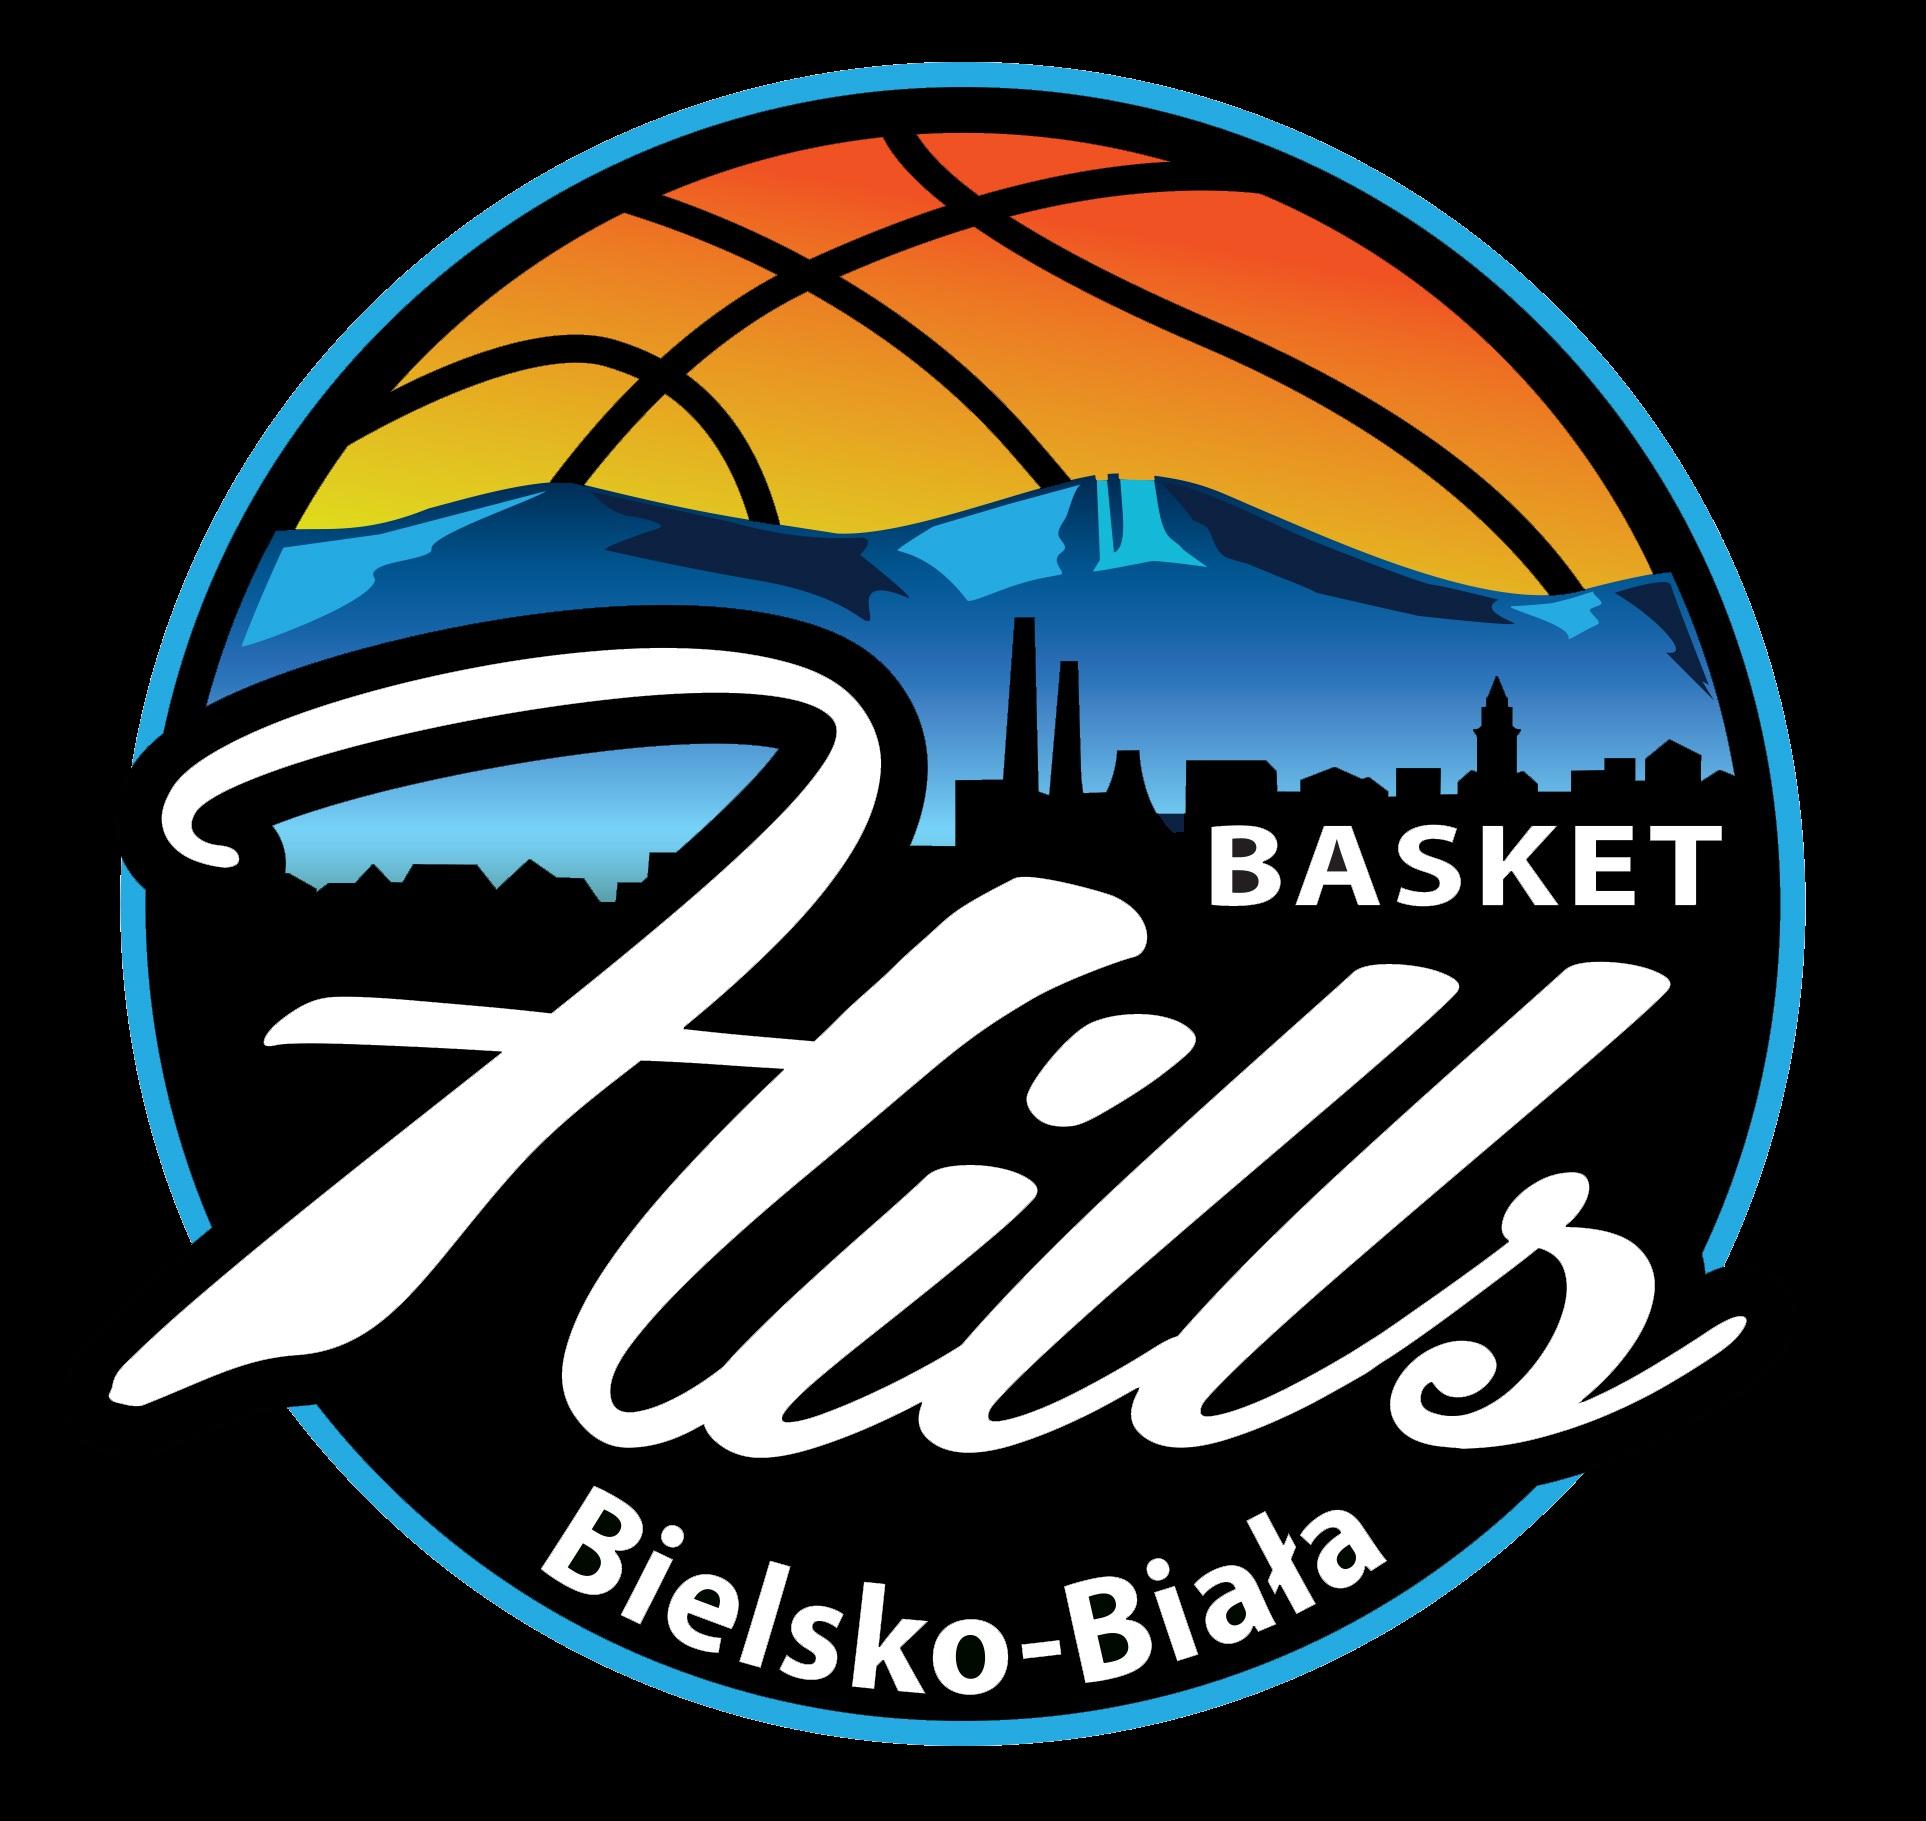 Koszykówka Basket Hills Bielsko-Biała